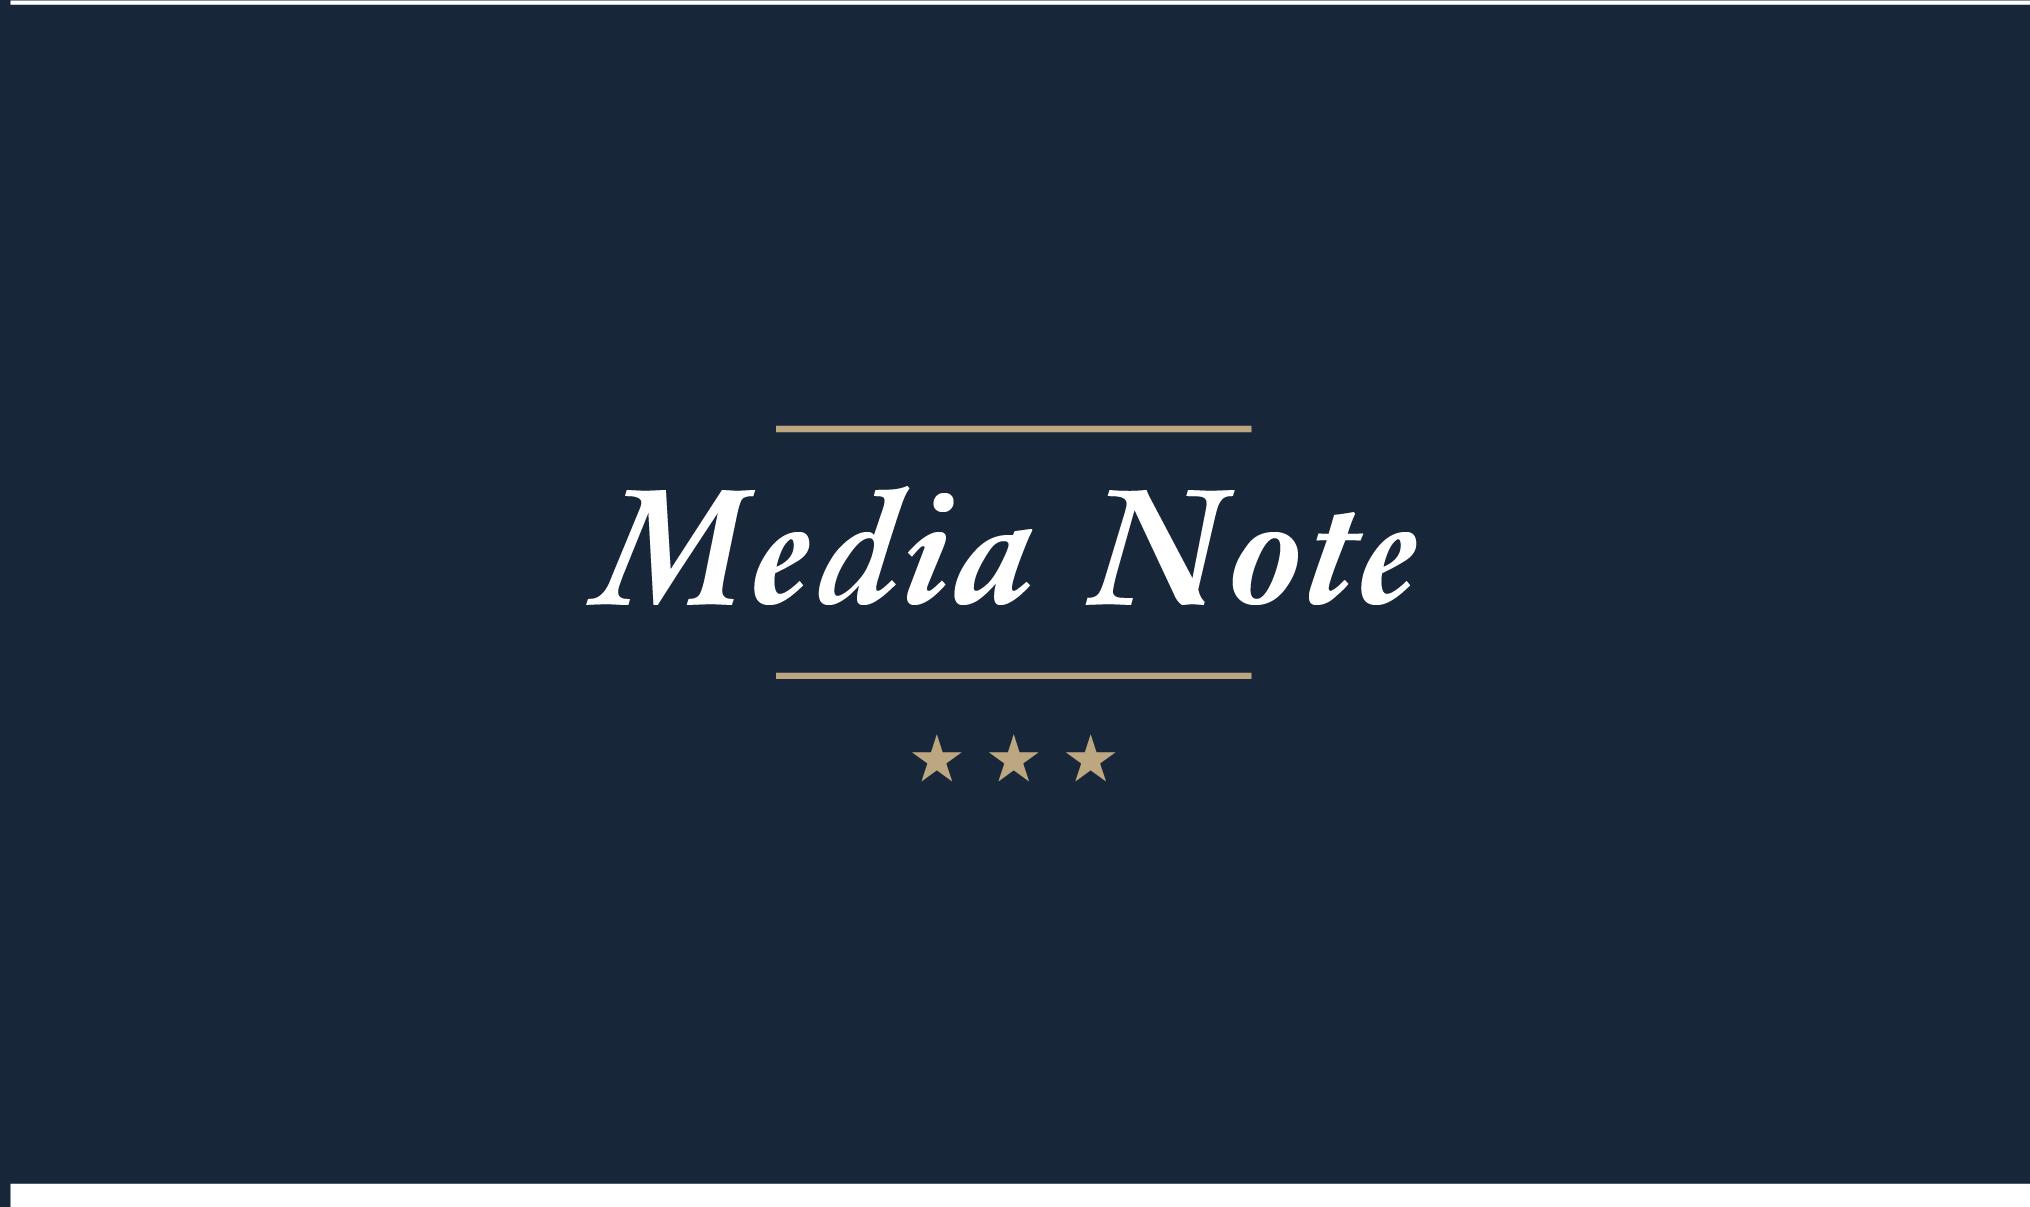 Media Note